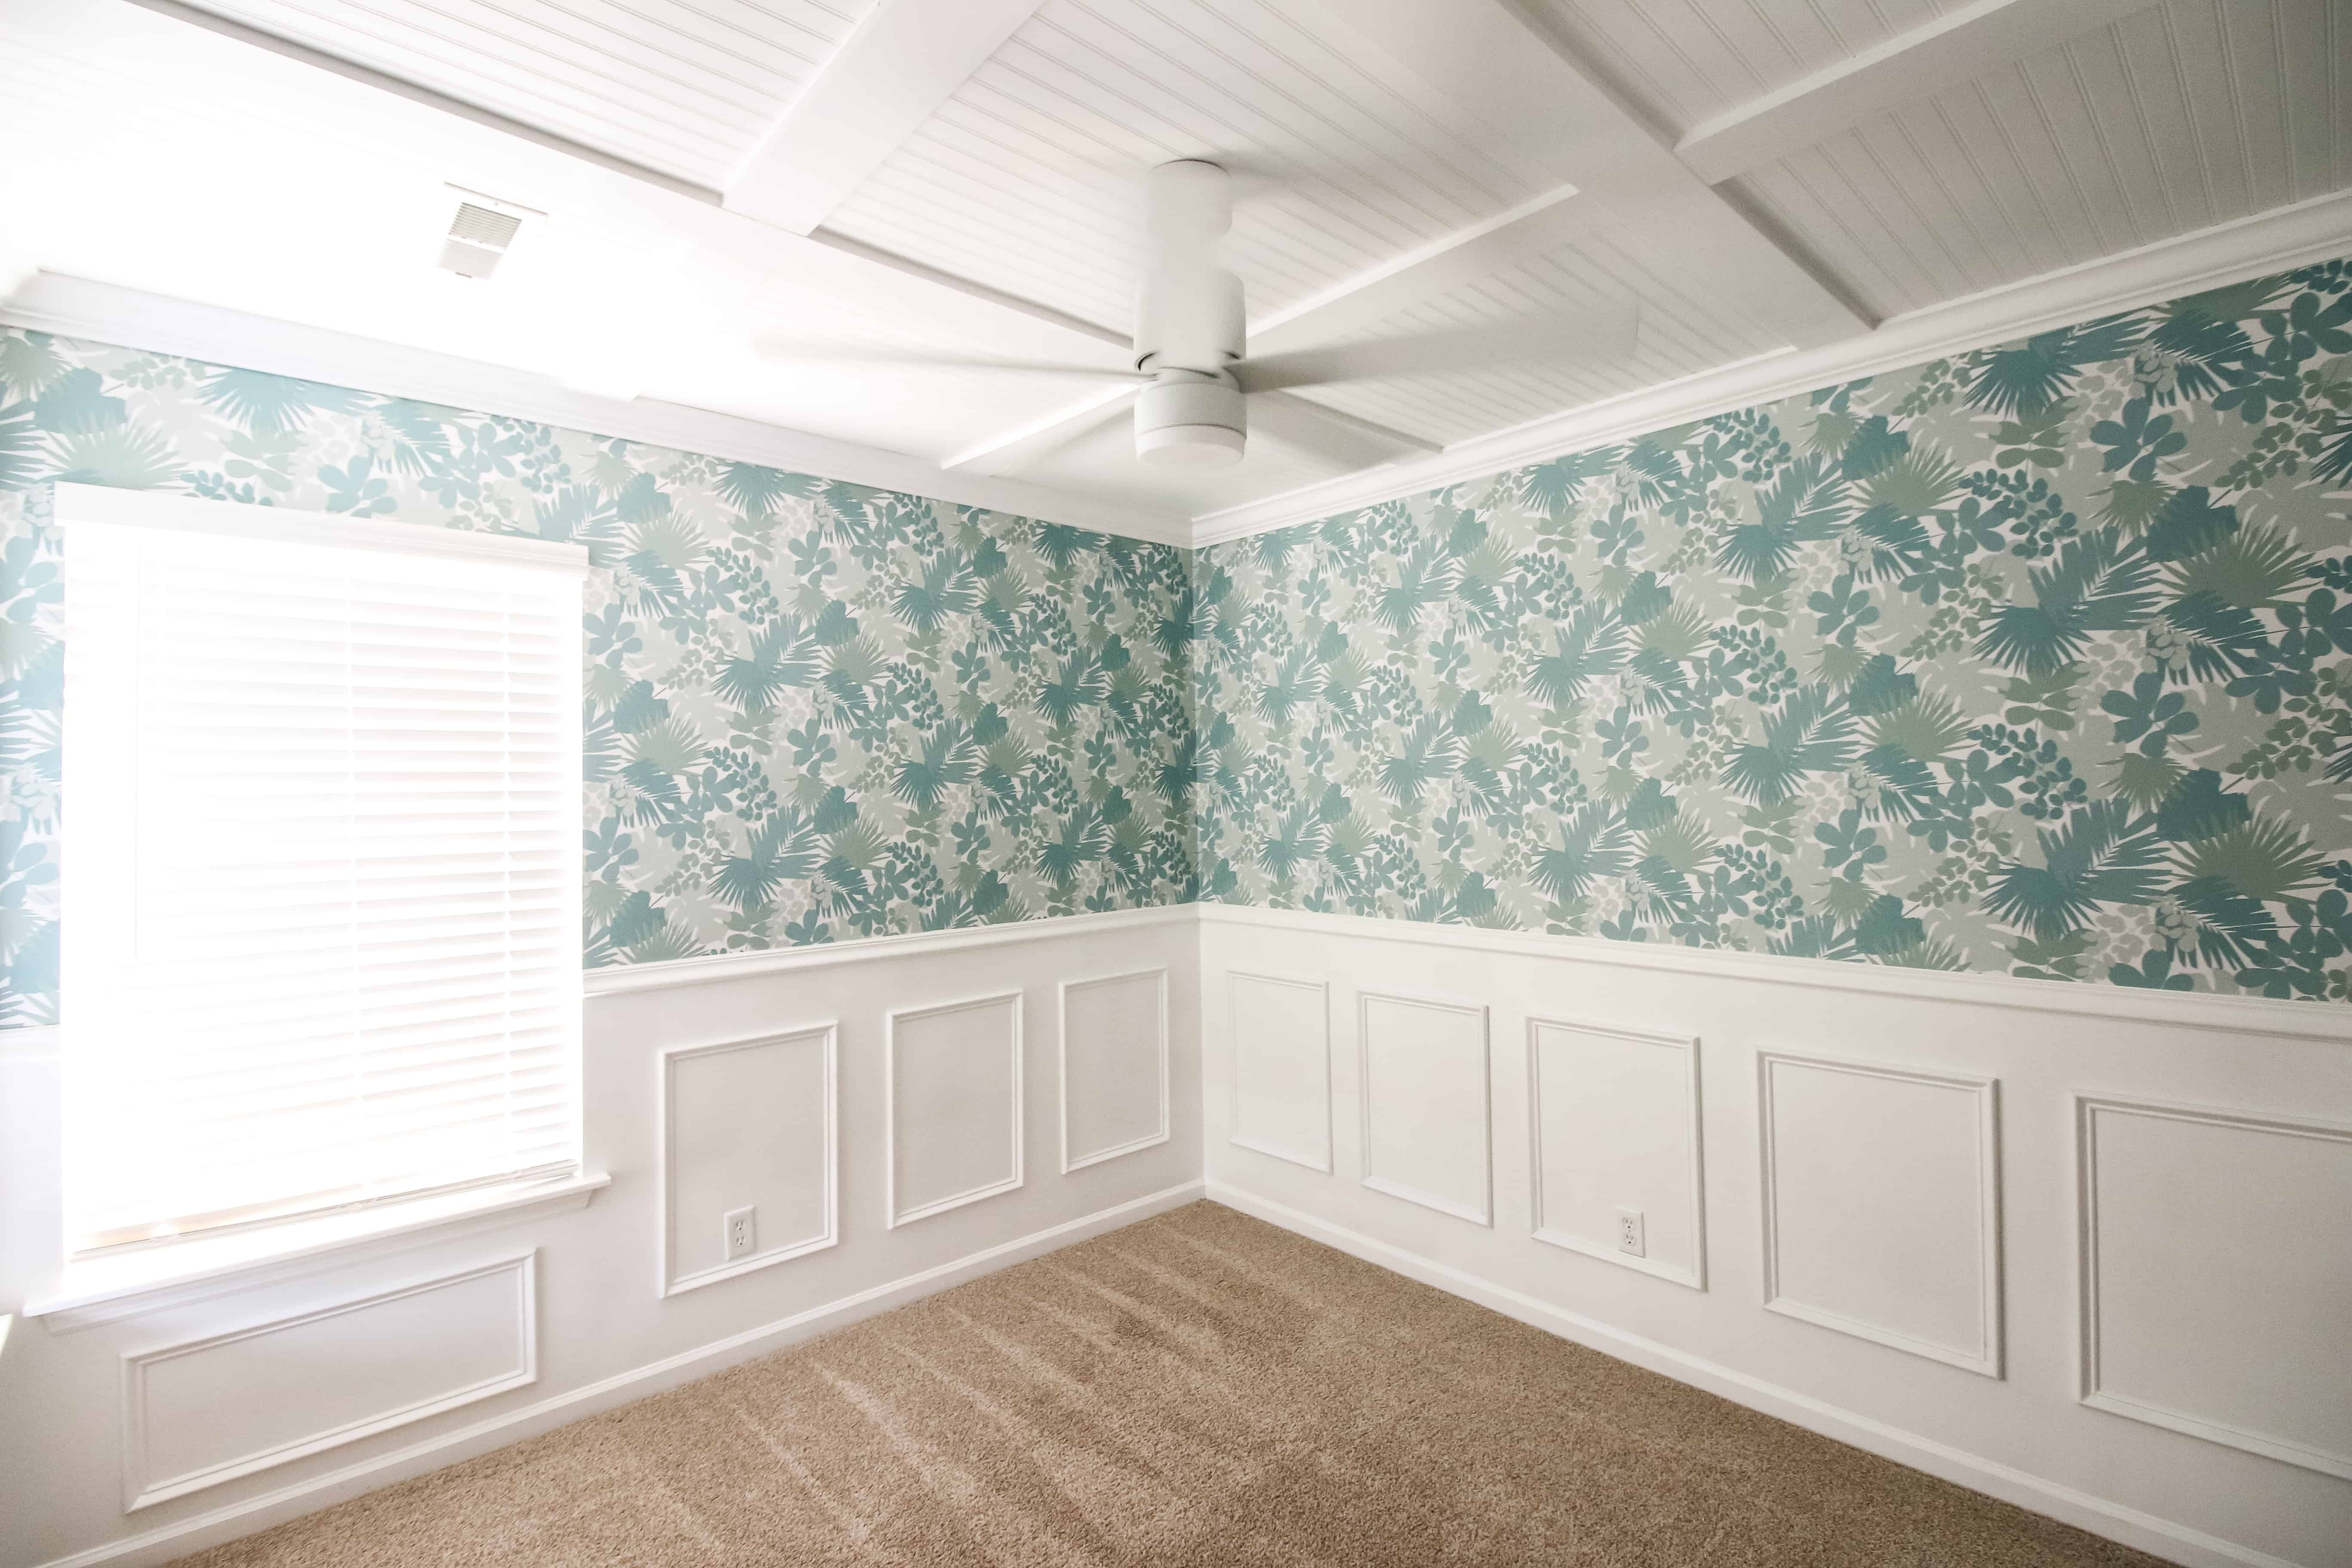 Diy Coffered Ceiling Coffered Ceiling Diy Ceiling Coffered Ceiling Design